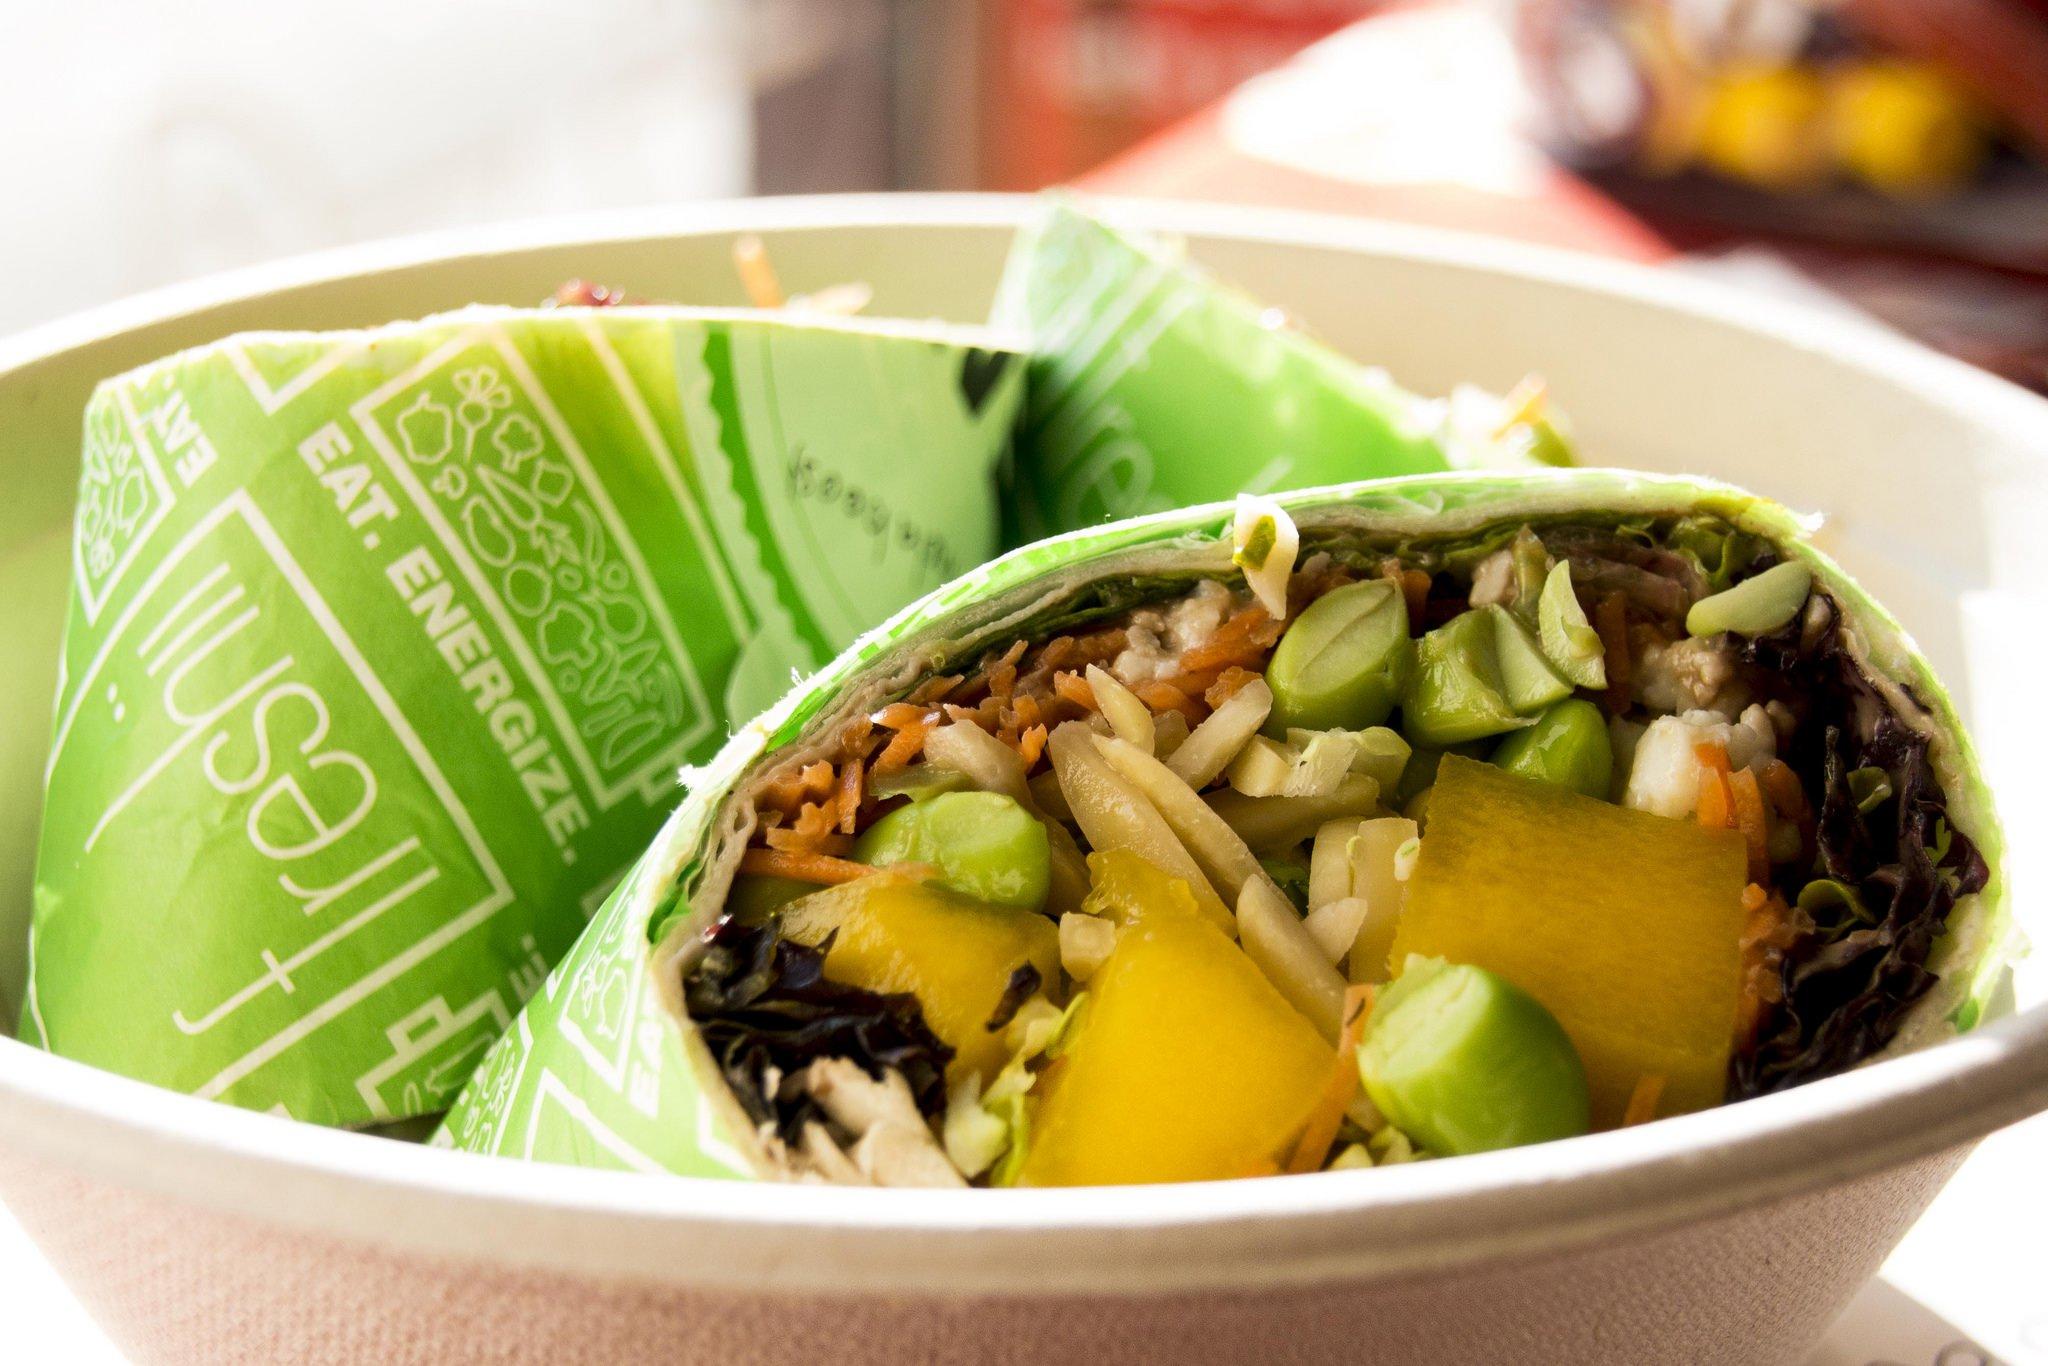 Toronto food Freshii burrito